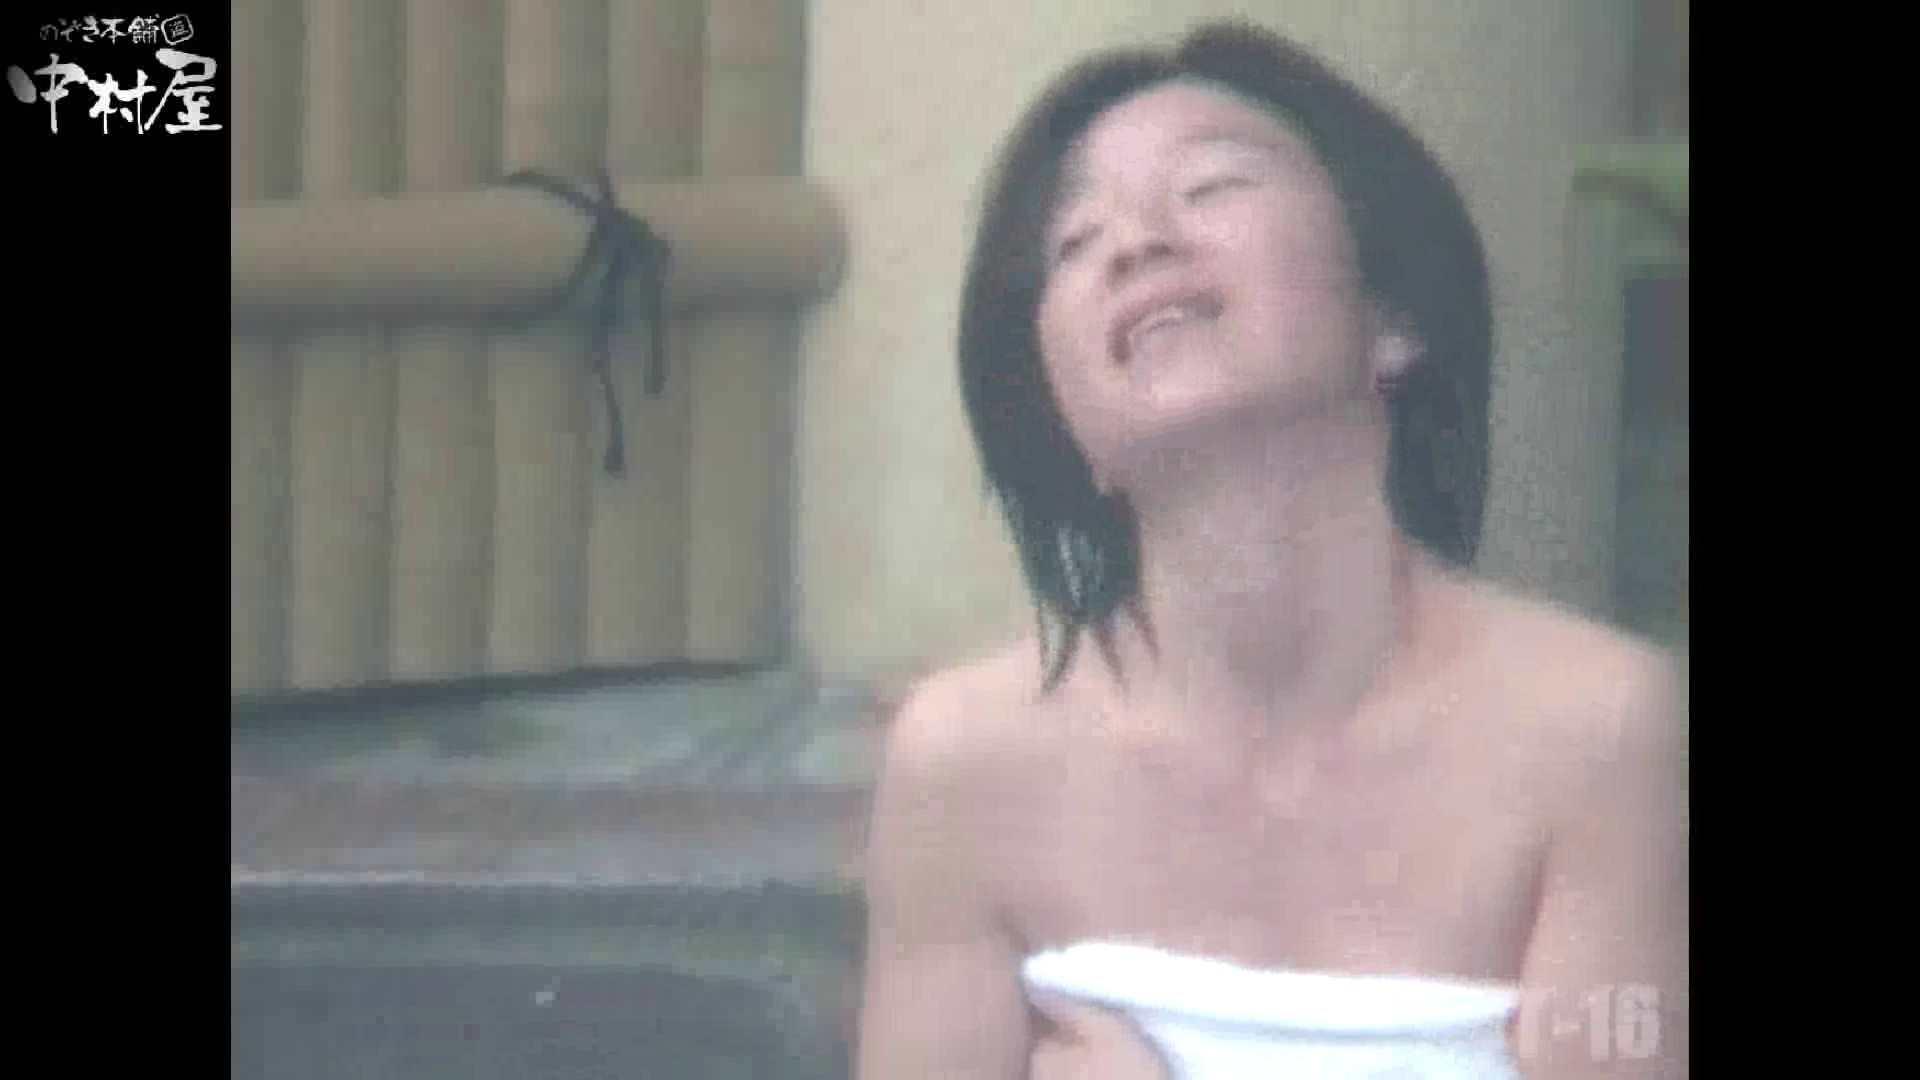 Aquaな露天風呂Vol.880潜入盗撮露天風呂十六判湯 其の三 潜入 | OLセックス  61画像 29